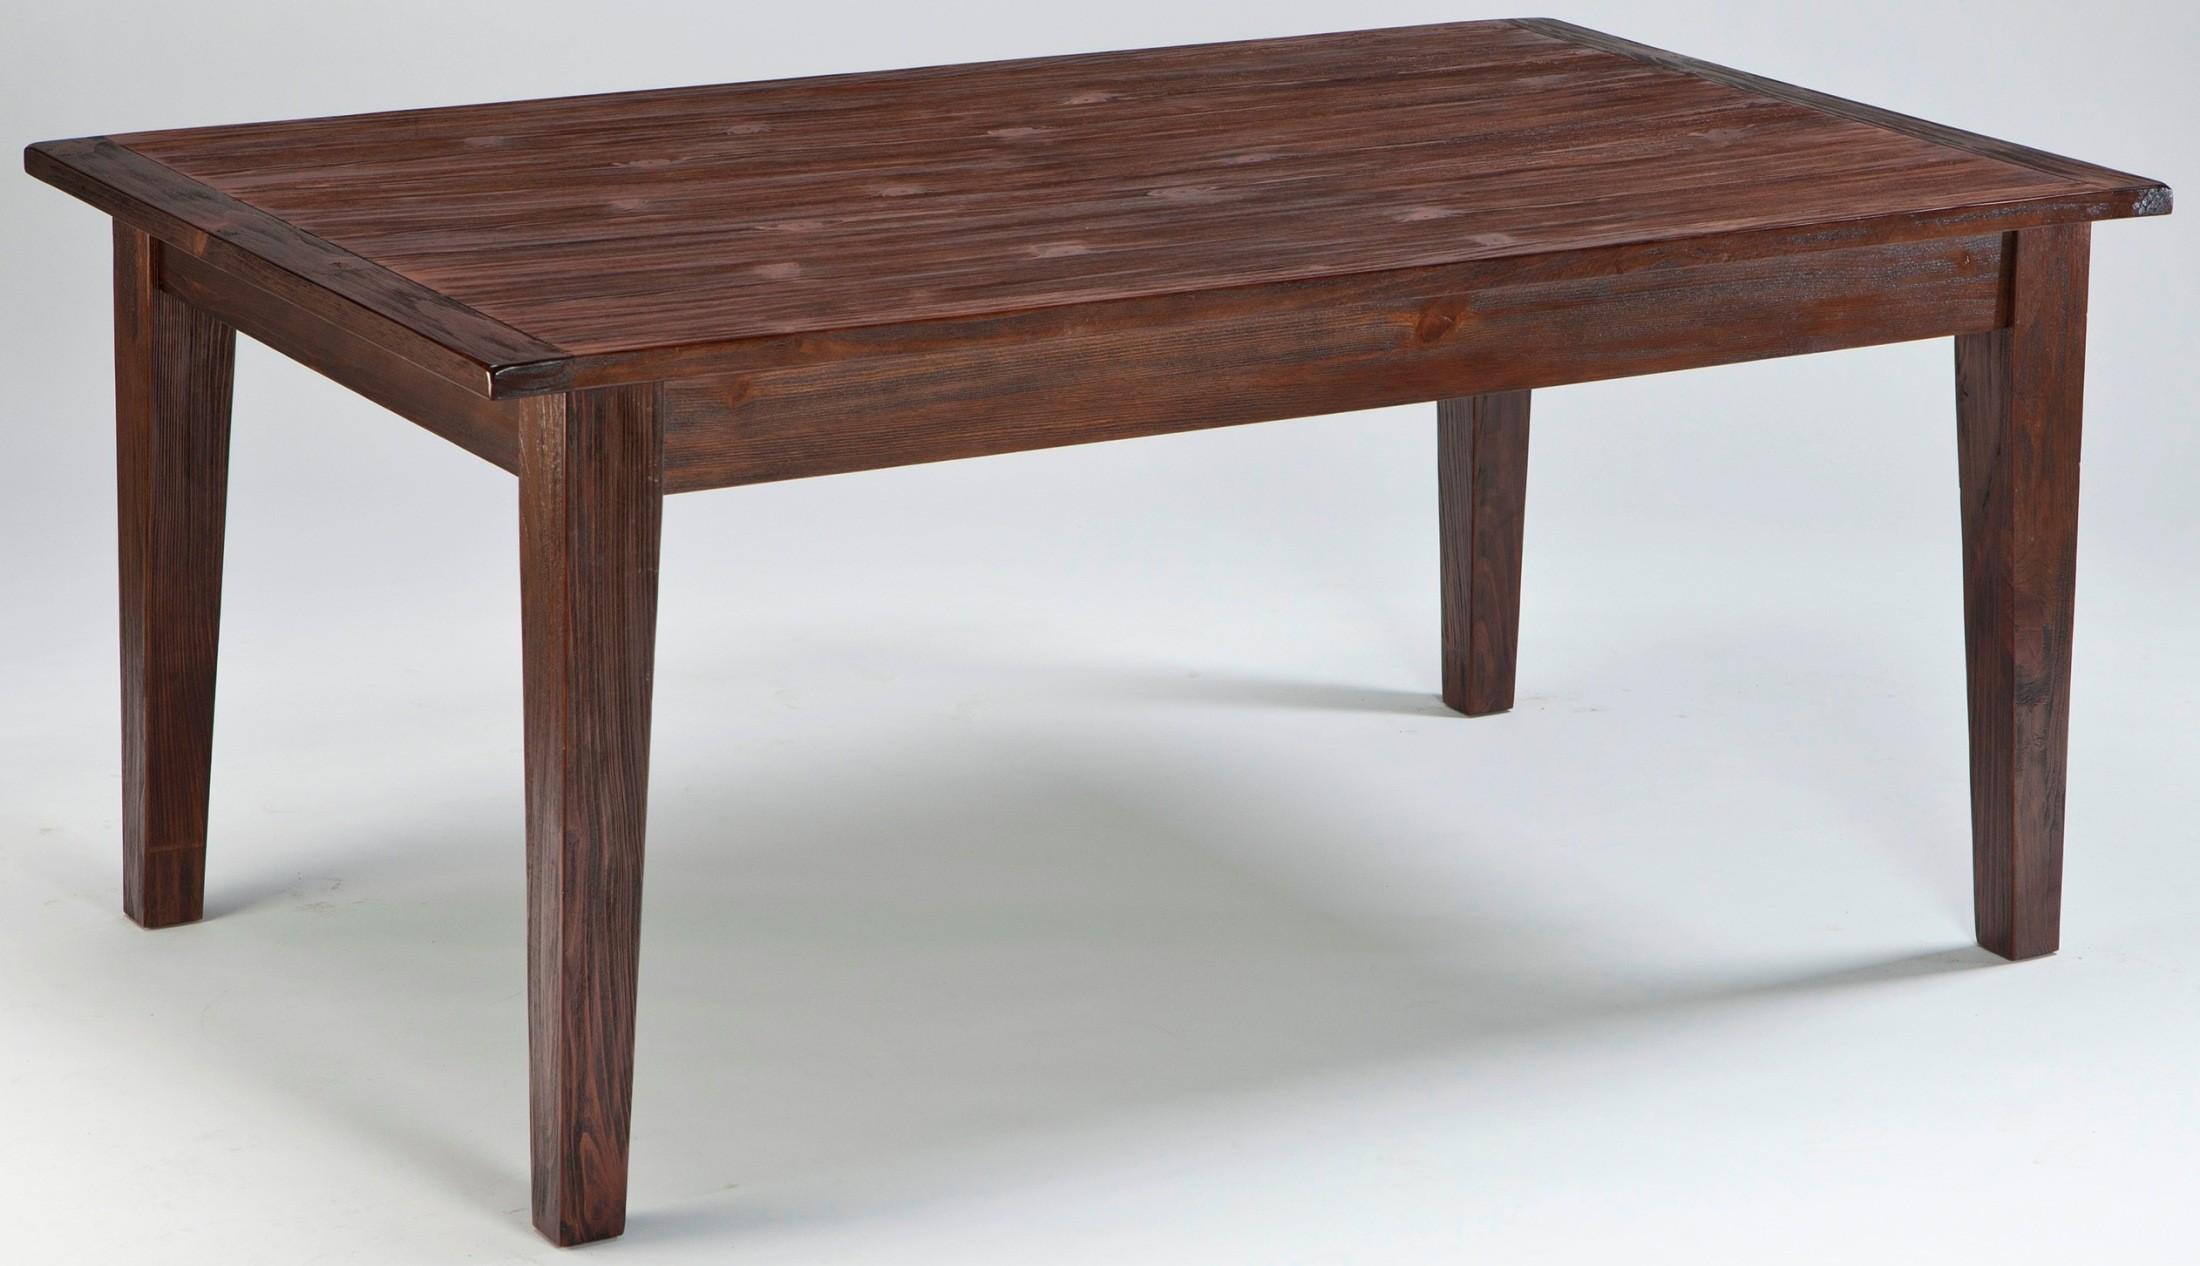 mestler dark brown rectangular dining room table from